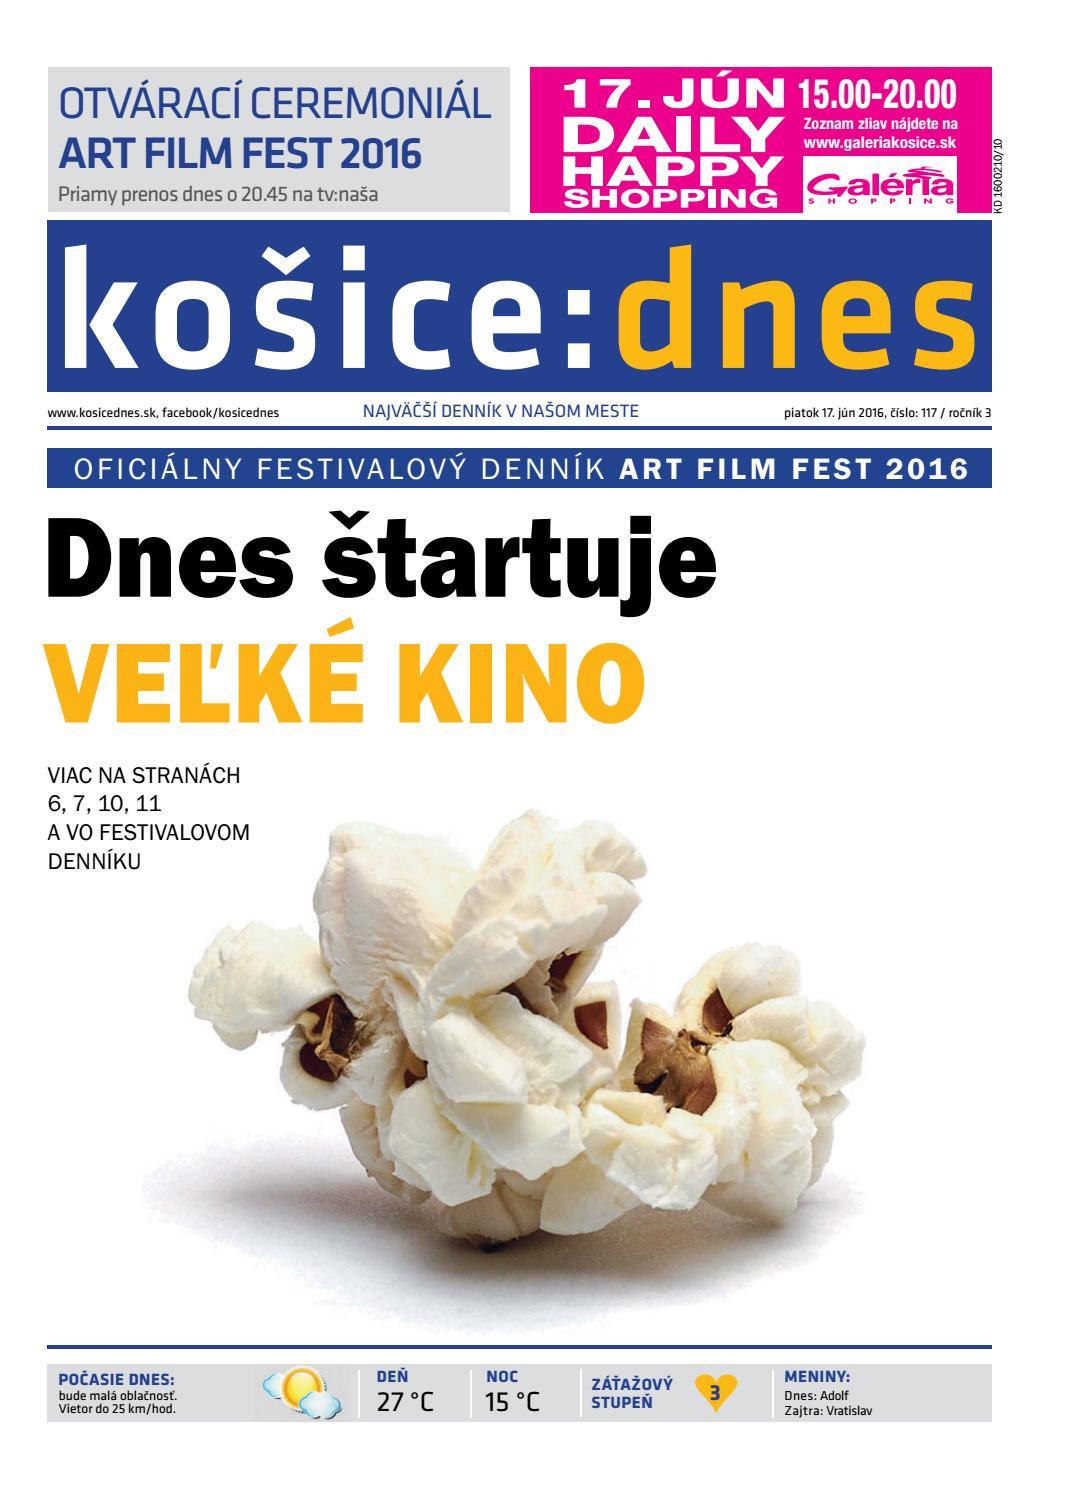 košice dnes 17.6.2016 by KOŠICE DNES - issuu 330feabf06a